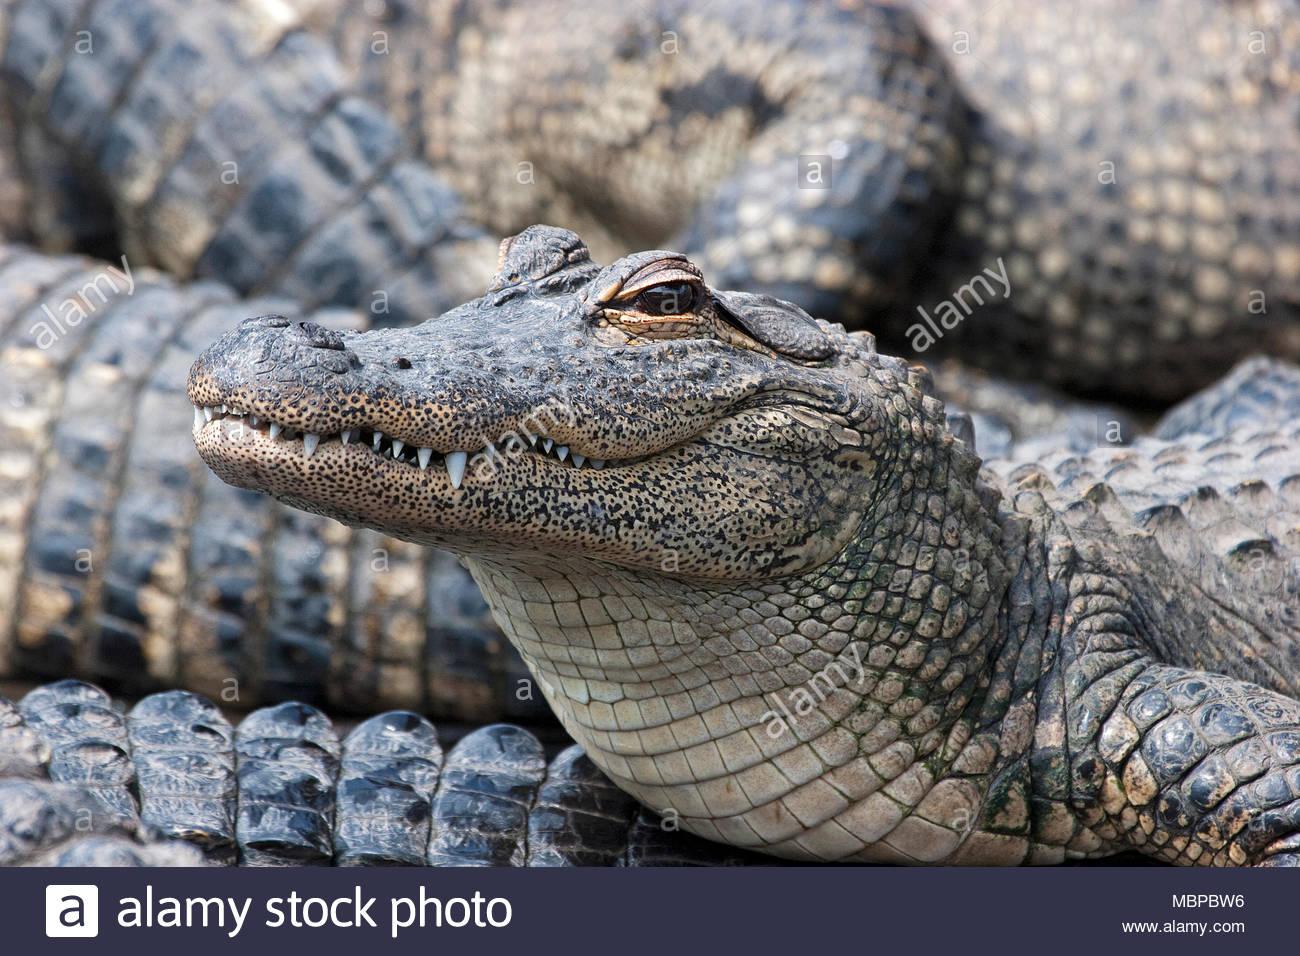 Alligator mississippiensis Mississippi (jacaré), grupo, juvenil, Everglades, na Flórida, Estados Unidos da América Imagens de Stock